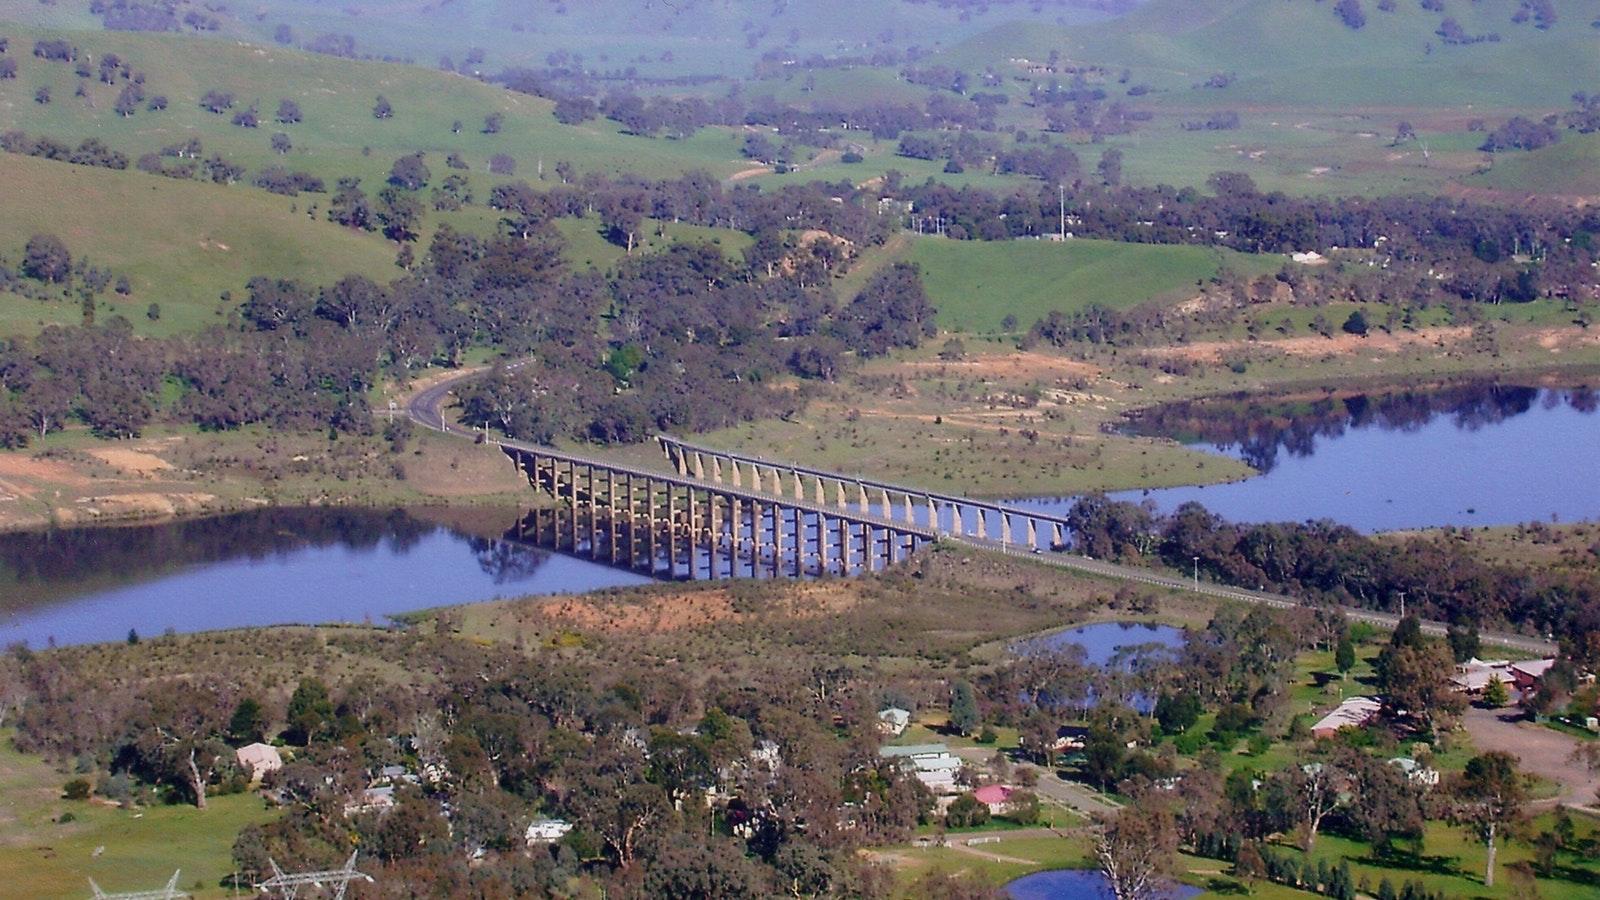 Bonnie Doon Bridge